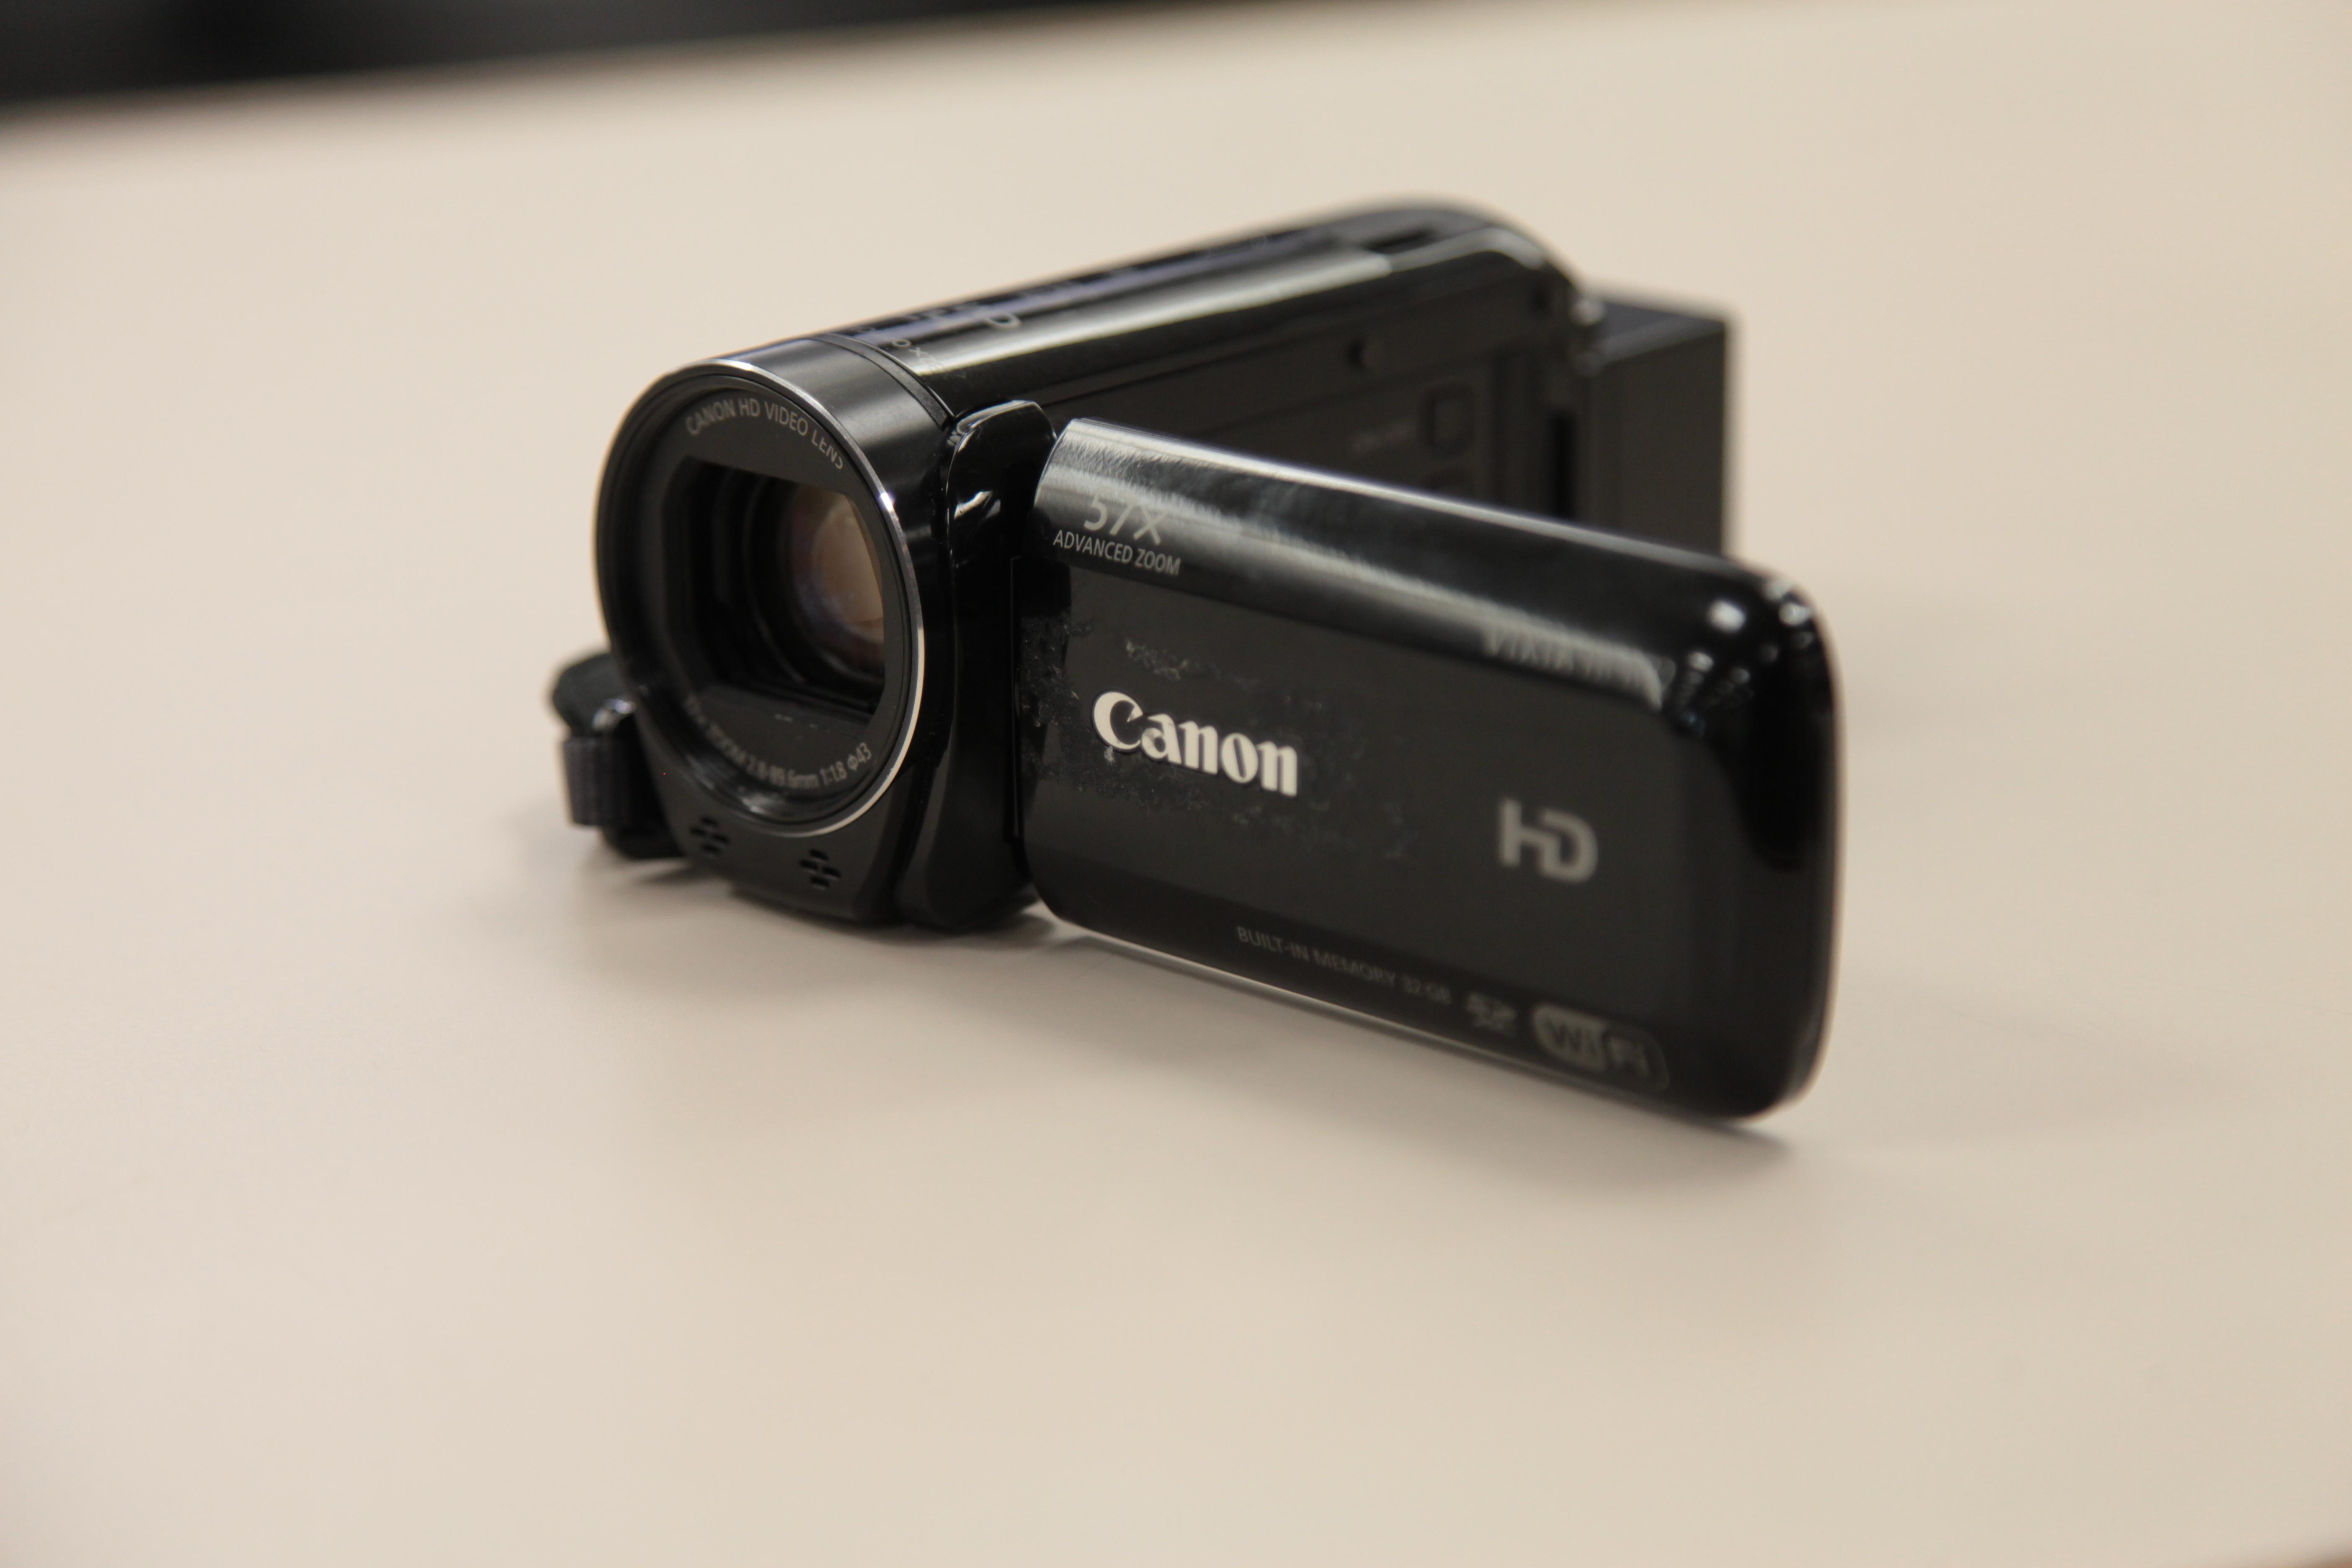 Canon Vixia video camera on a counter